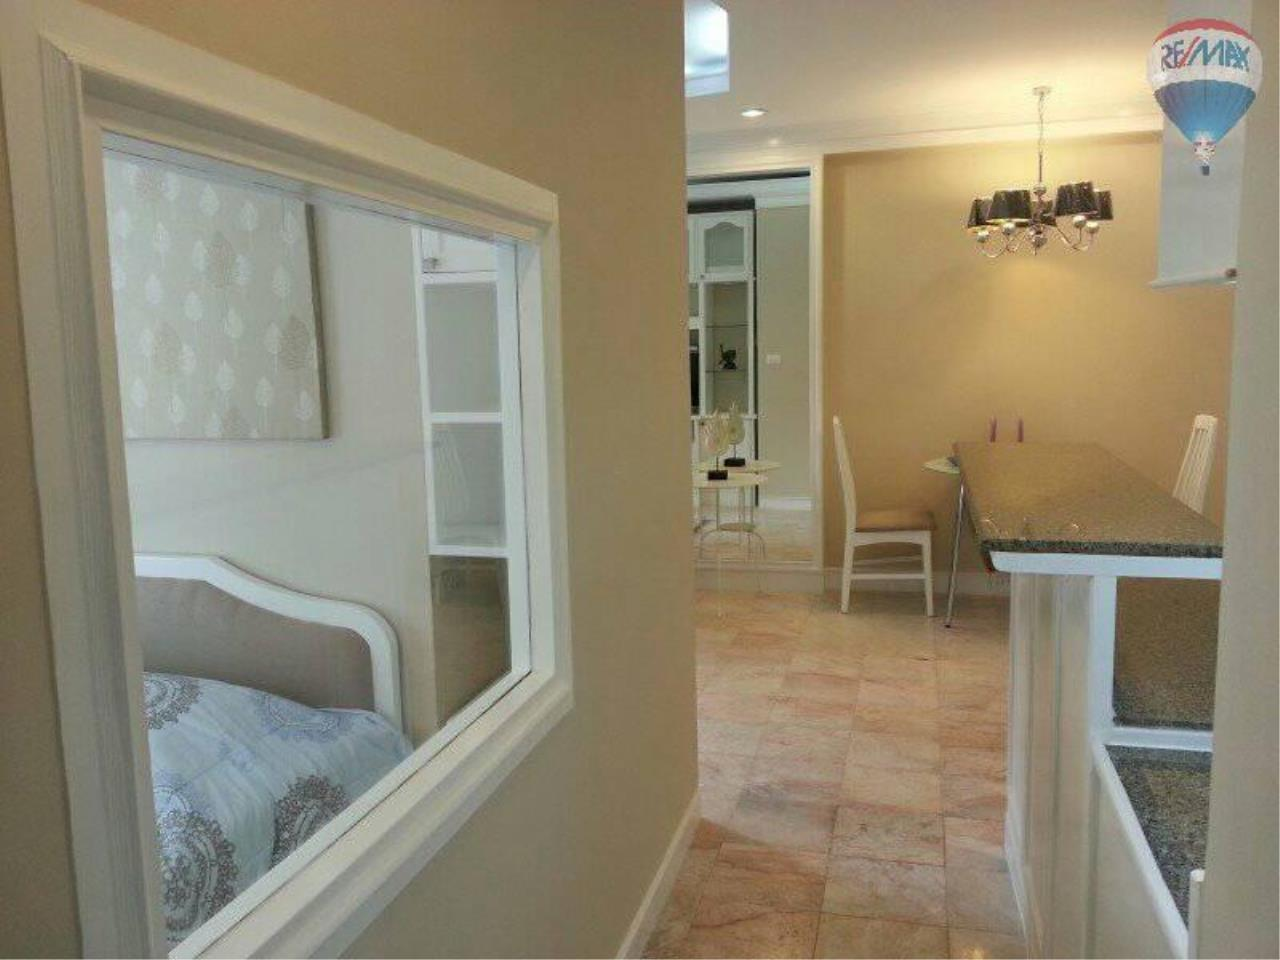 RE/MAX Properties Agency's 1 Bedroom 60 Sq.m for RENT at Saranjai Mansion,Sukhumvit Soi 4 (Nana) 5